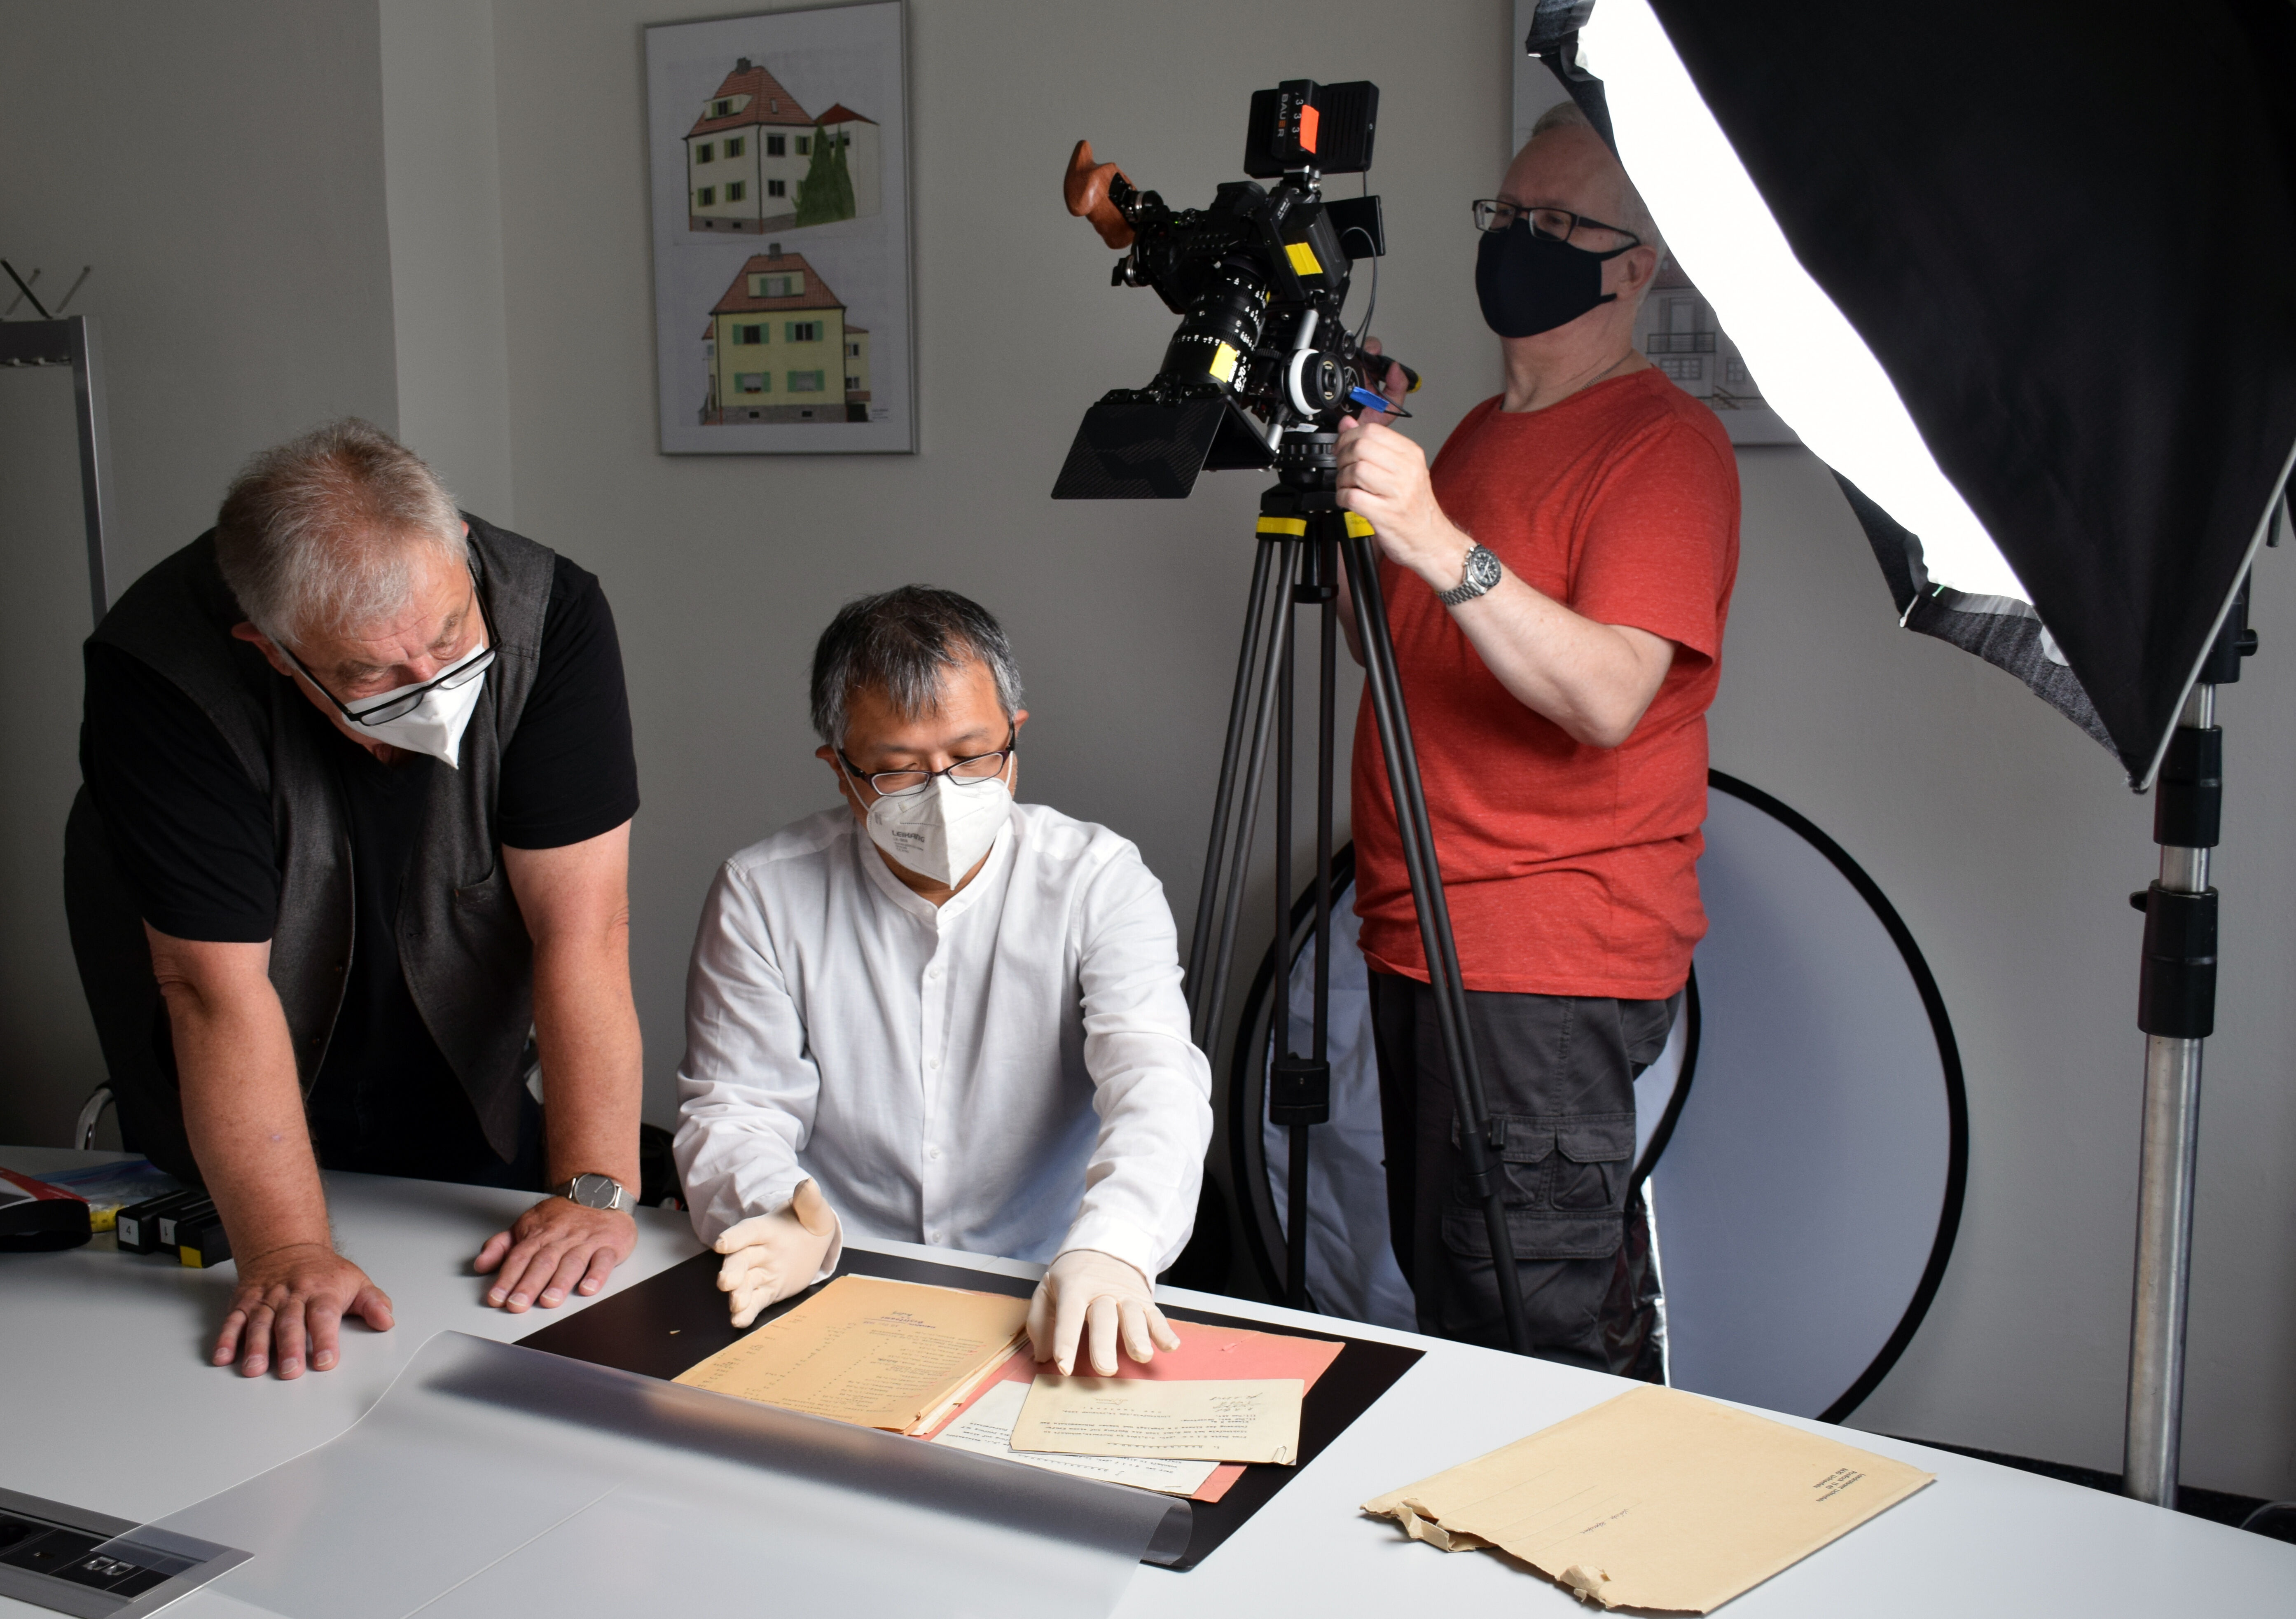 Bei den Dreharbeiten zum Dokumentarfilm: der Leiter des P-Seminars, Studiendirektor a.D. Manfred Brösamle-Lambrecht, Regissseur Ryoya Terao, Kameraman